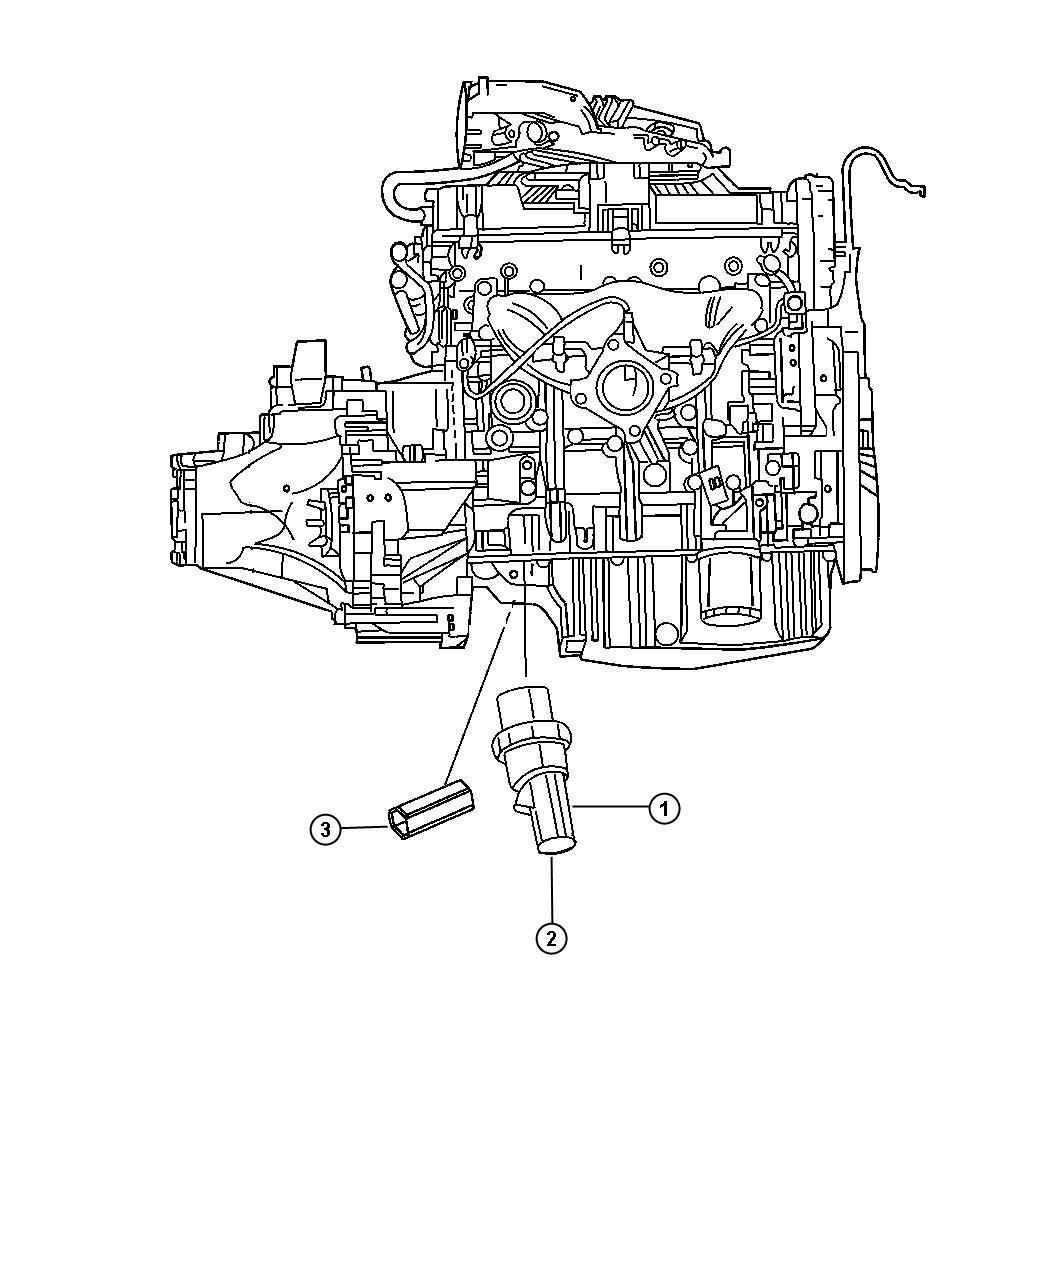 Chrysler 200 Switches Powertrain